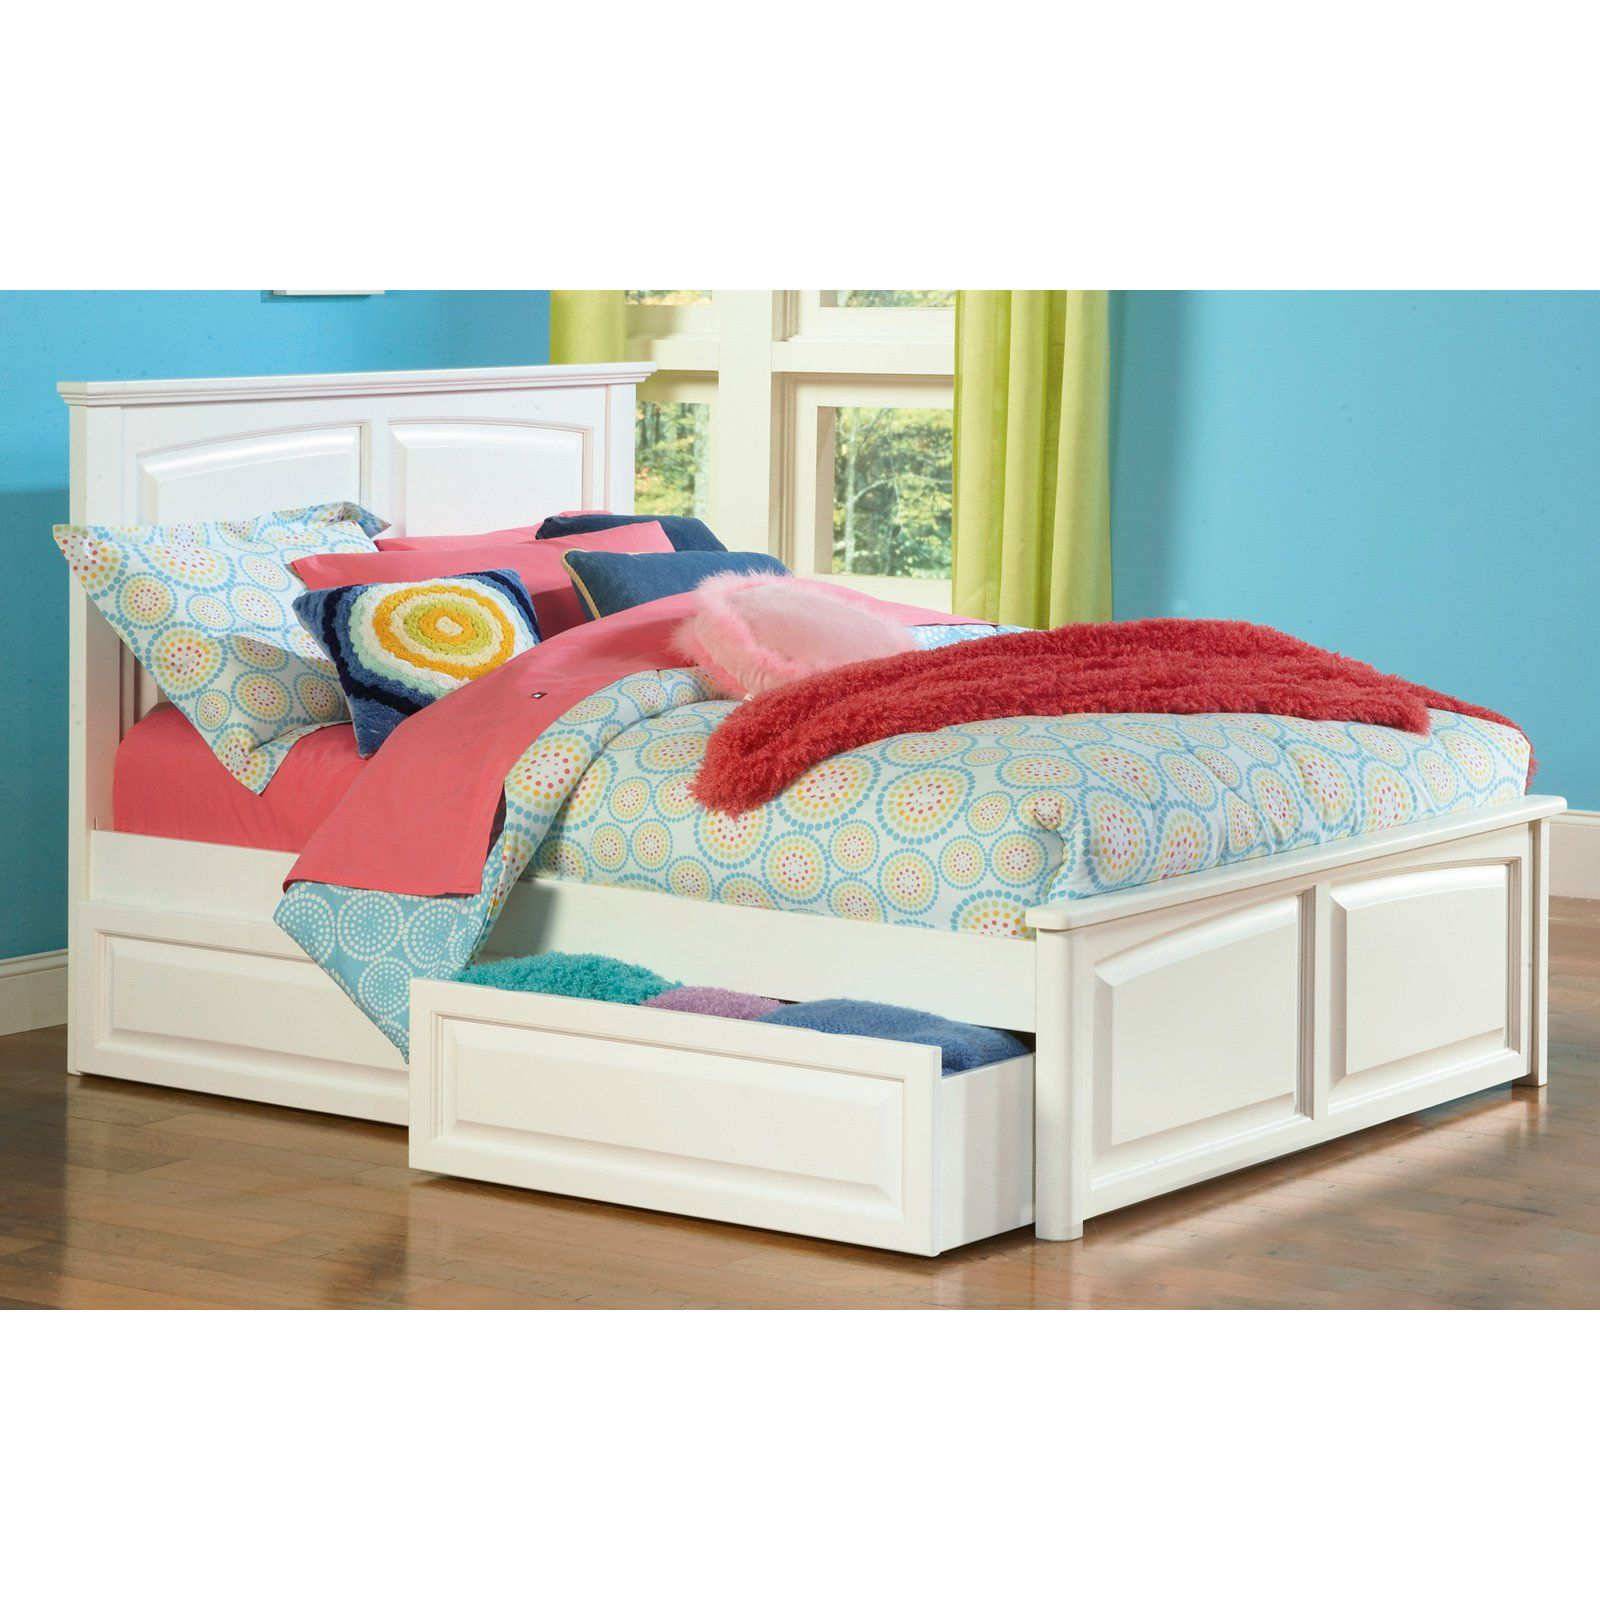 Monterey Platform Bed Www Hayneedle Com Bed Frame With Storage Kids Beds With Storage Bed Storage